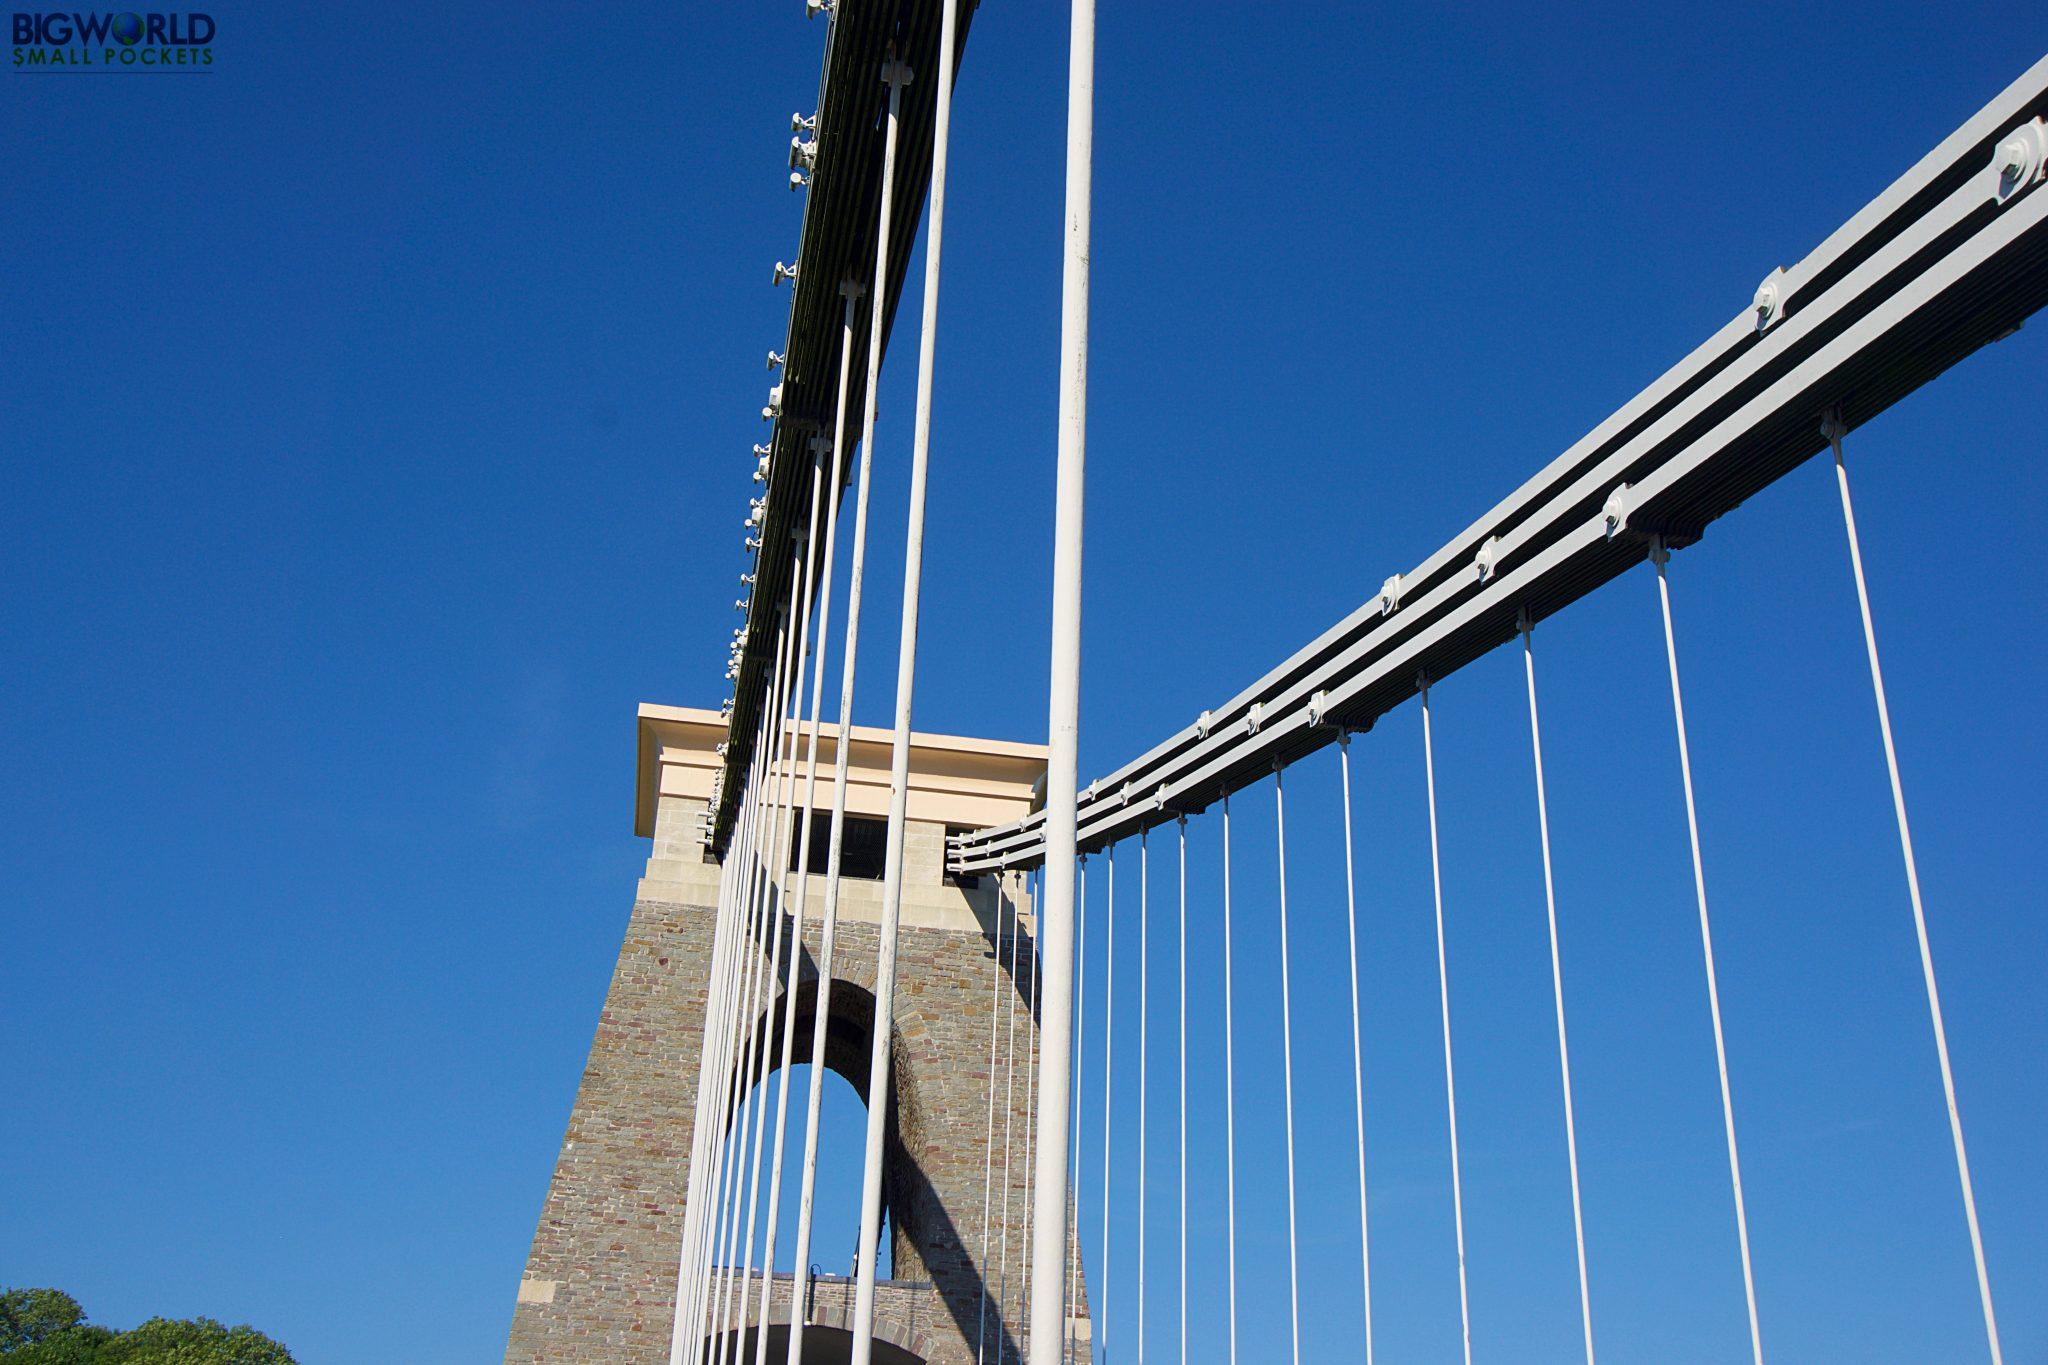 England, Bristol, Clifton Suspension Bridge